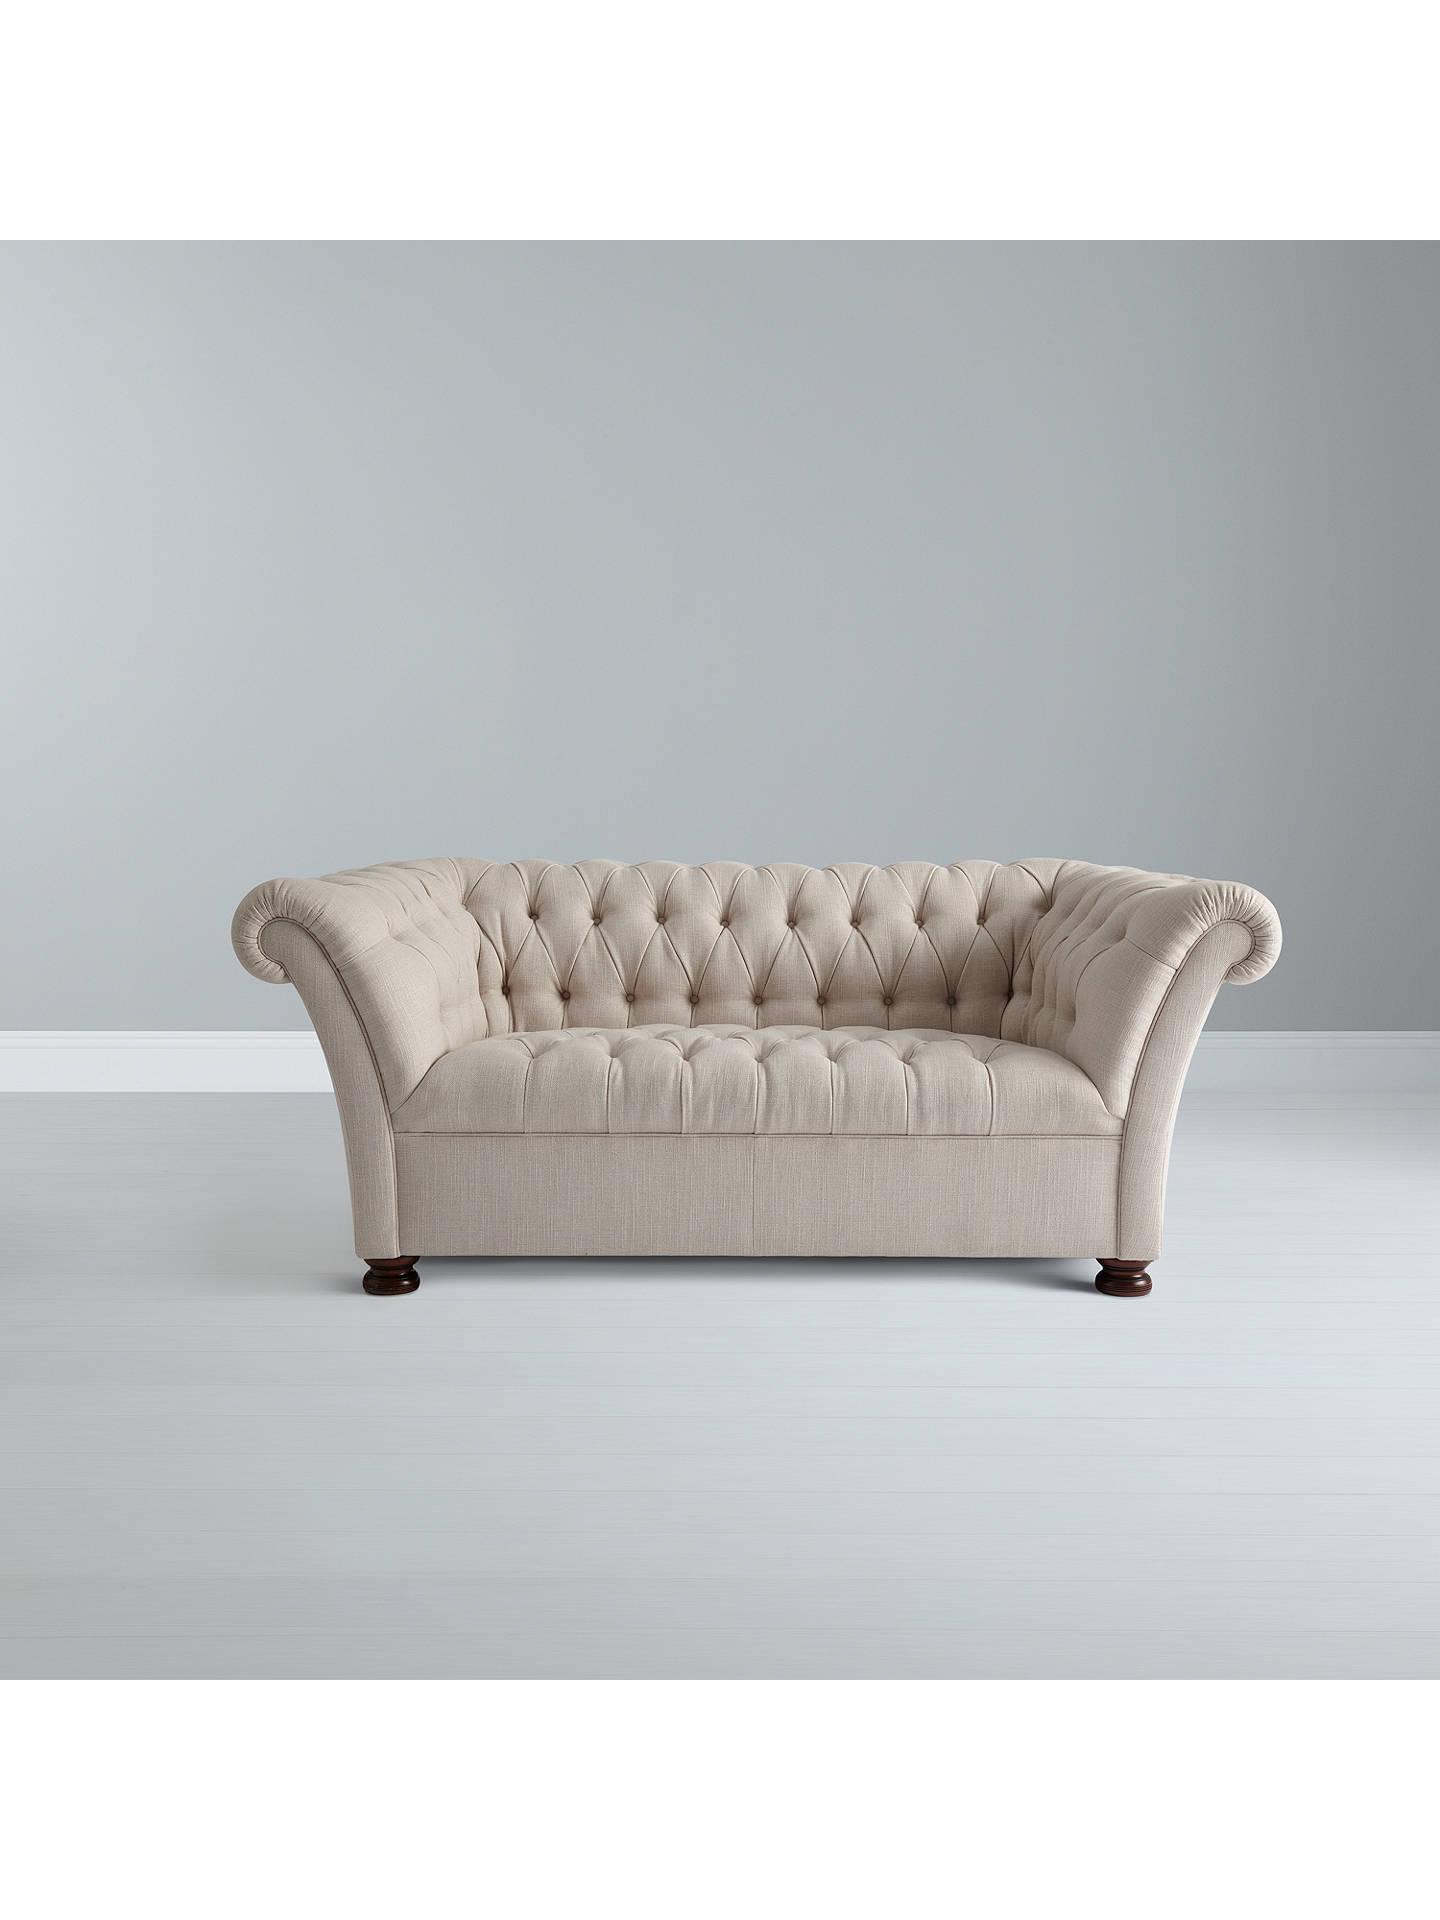 Chesterfield Sofa Linen At John Lewis